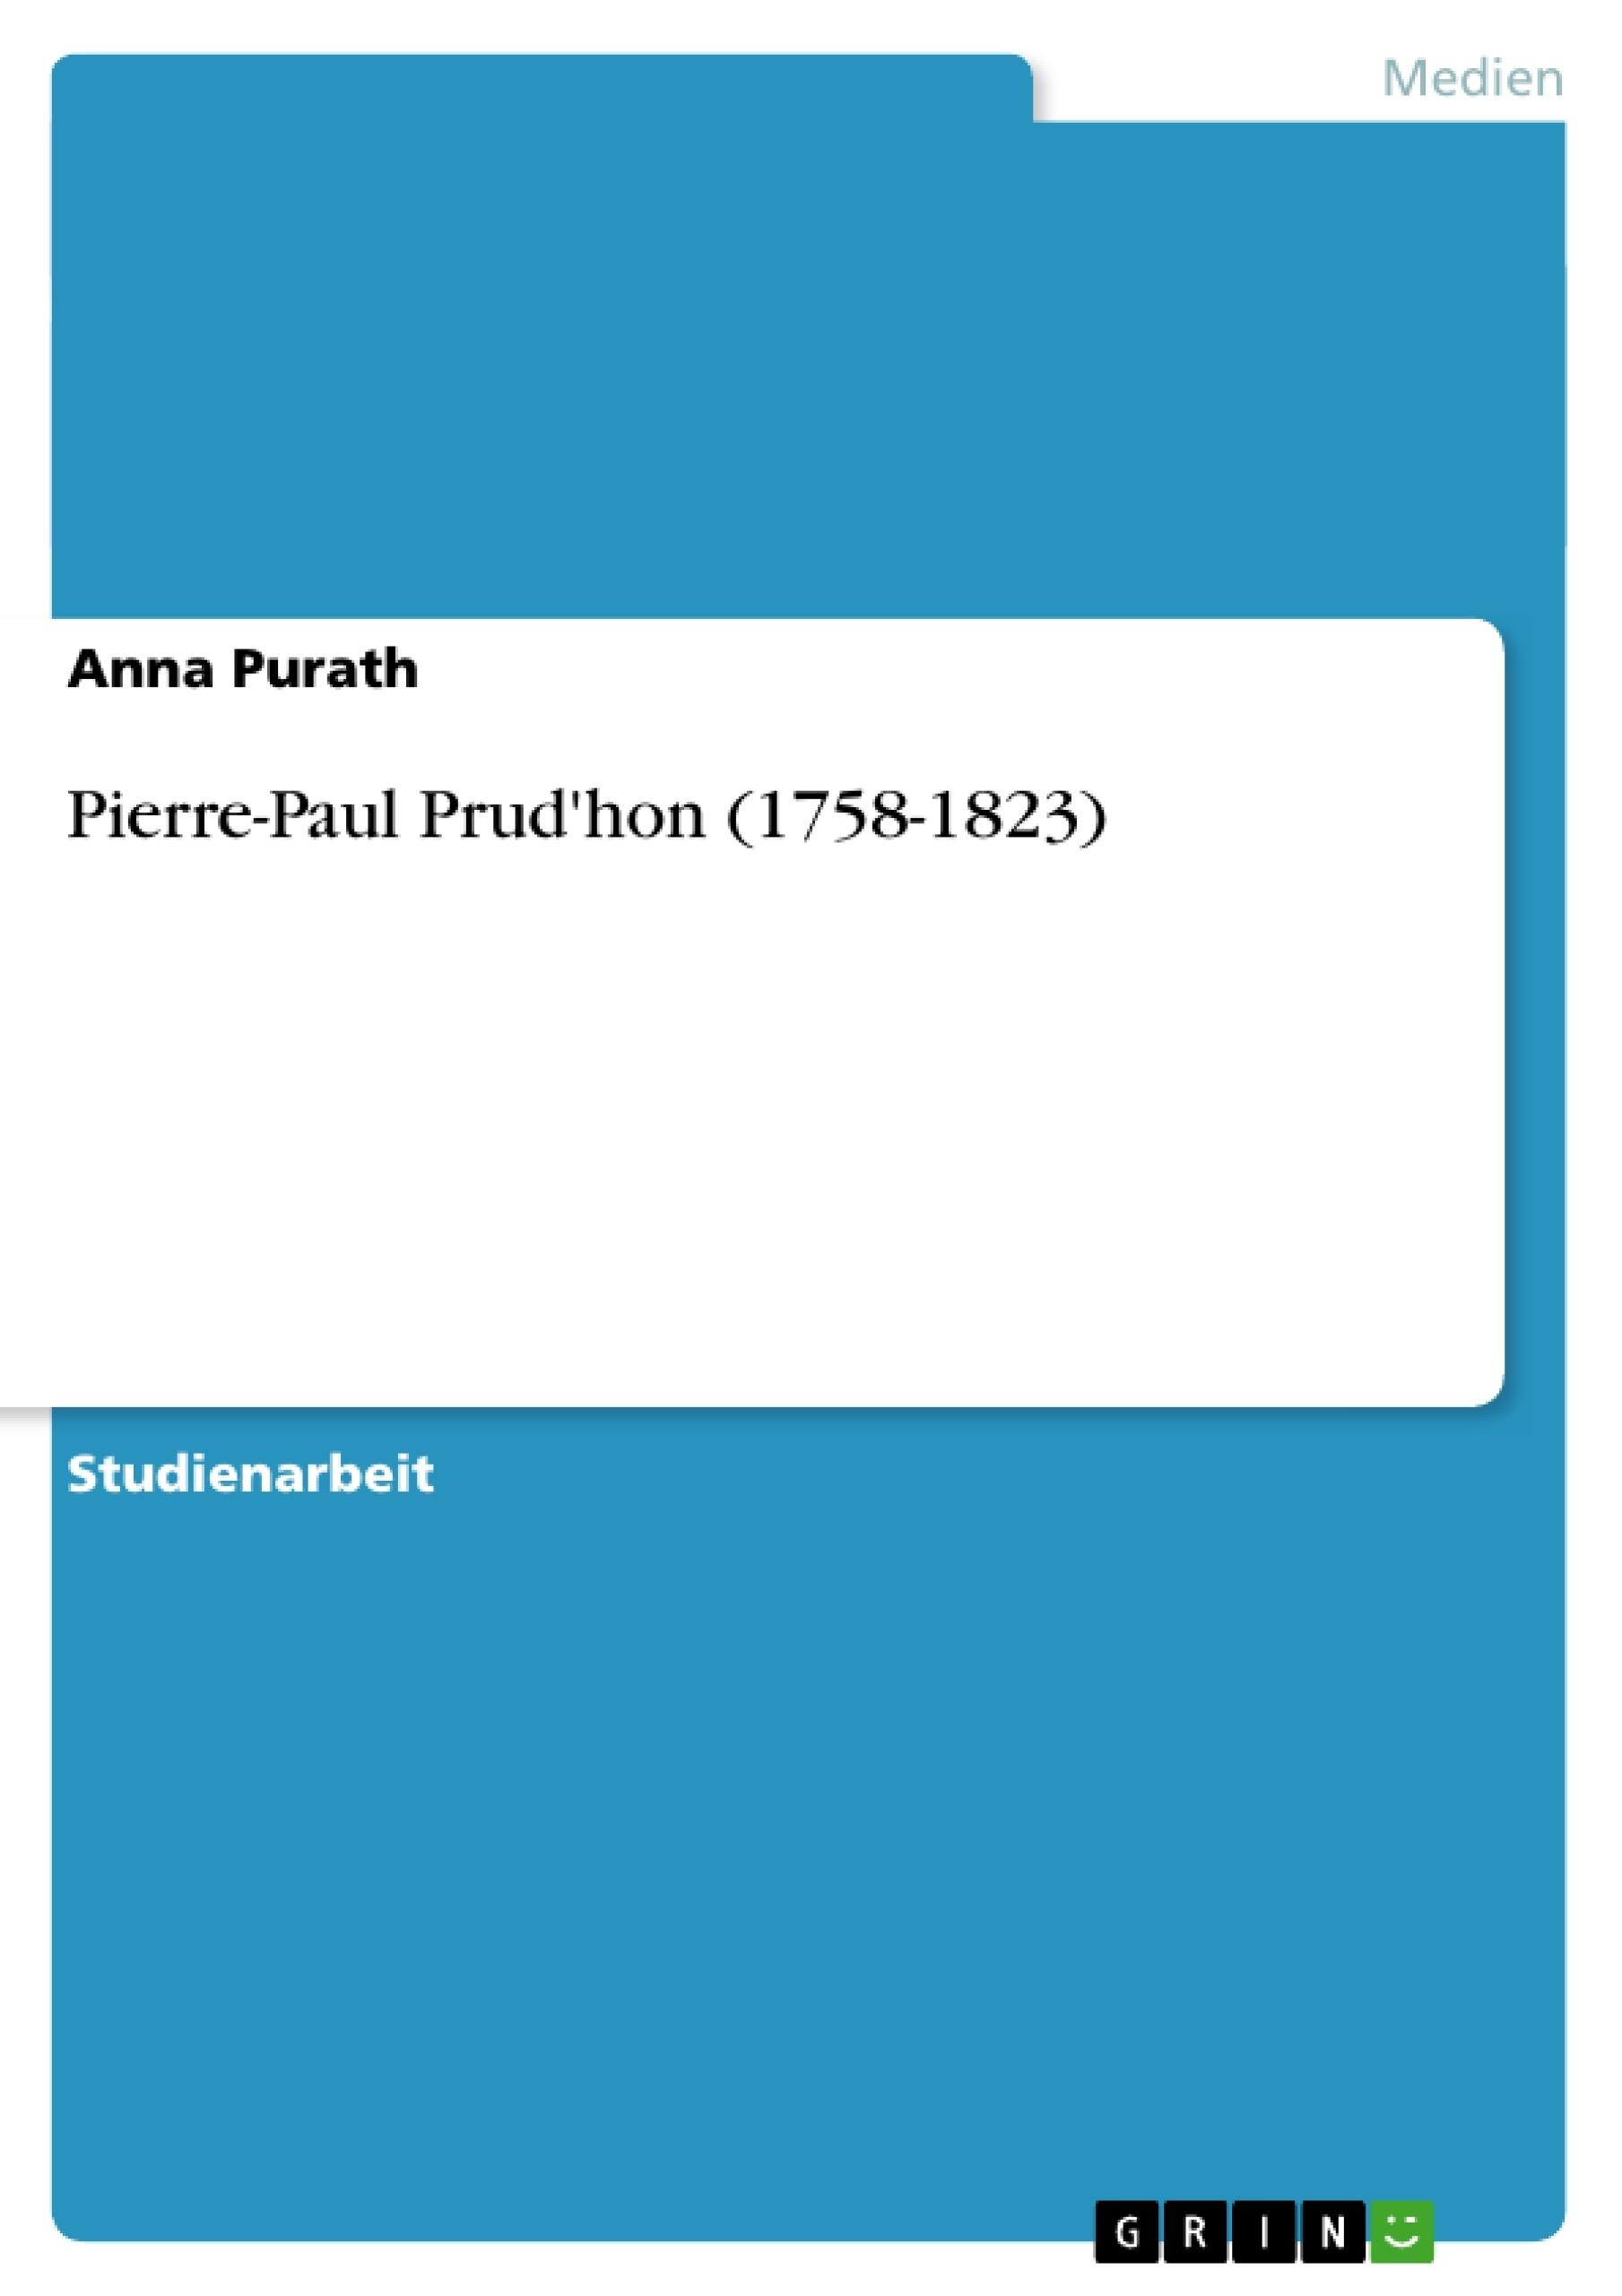 Titel: Pierre-Paul Prud'hon (1758-1823)